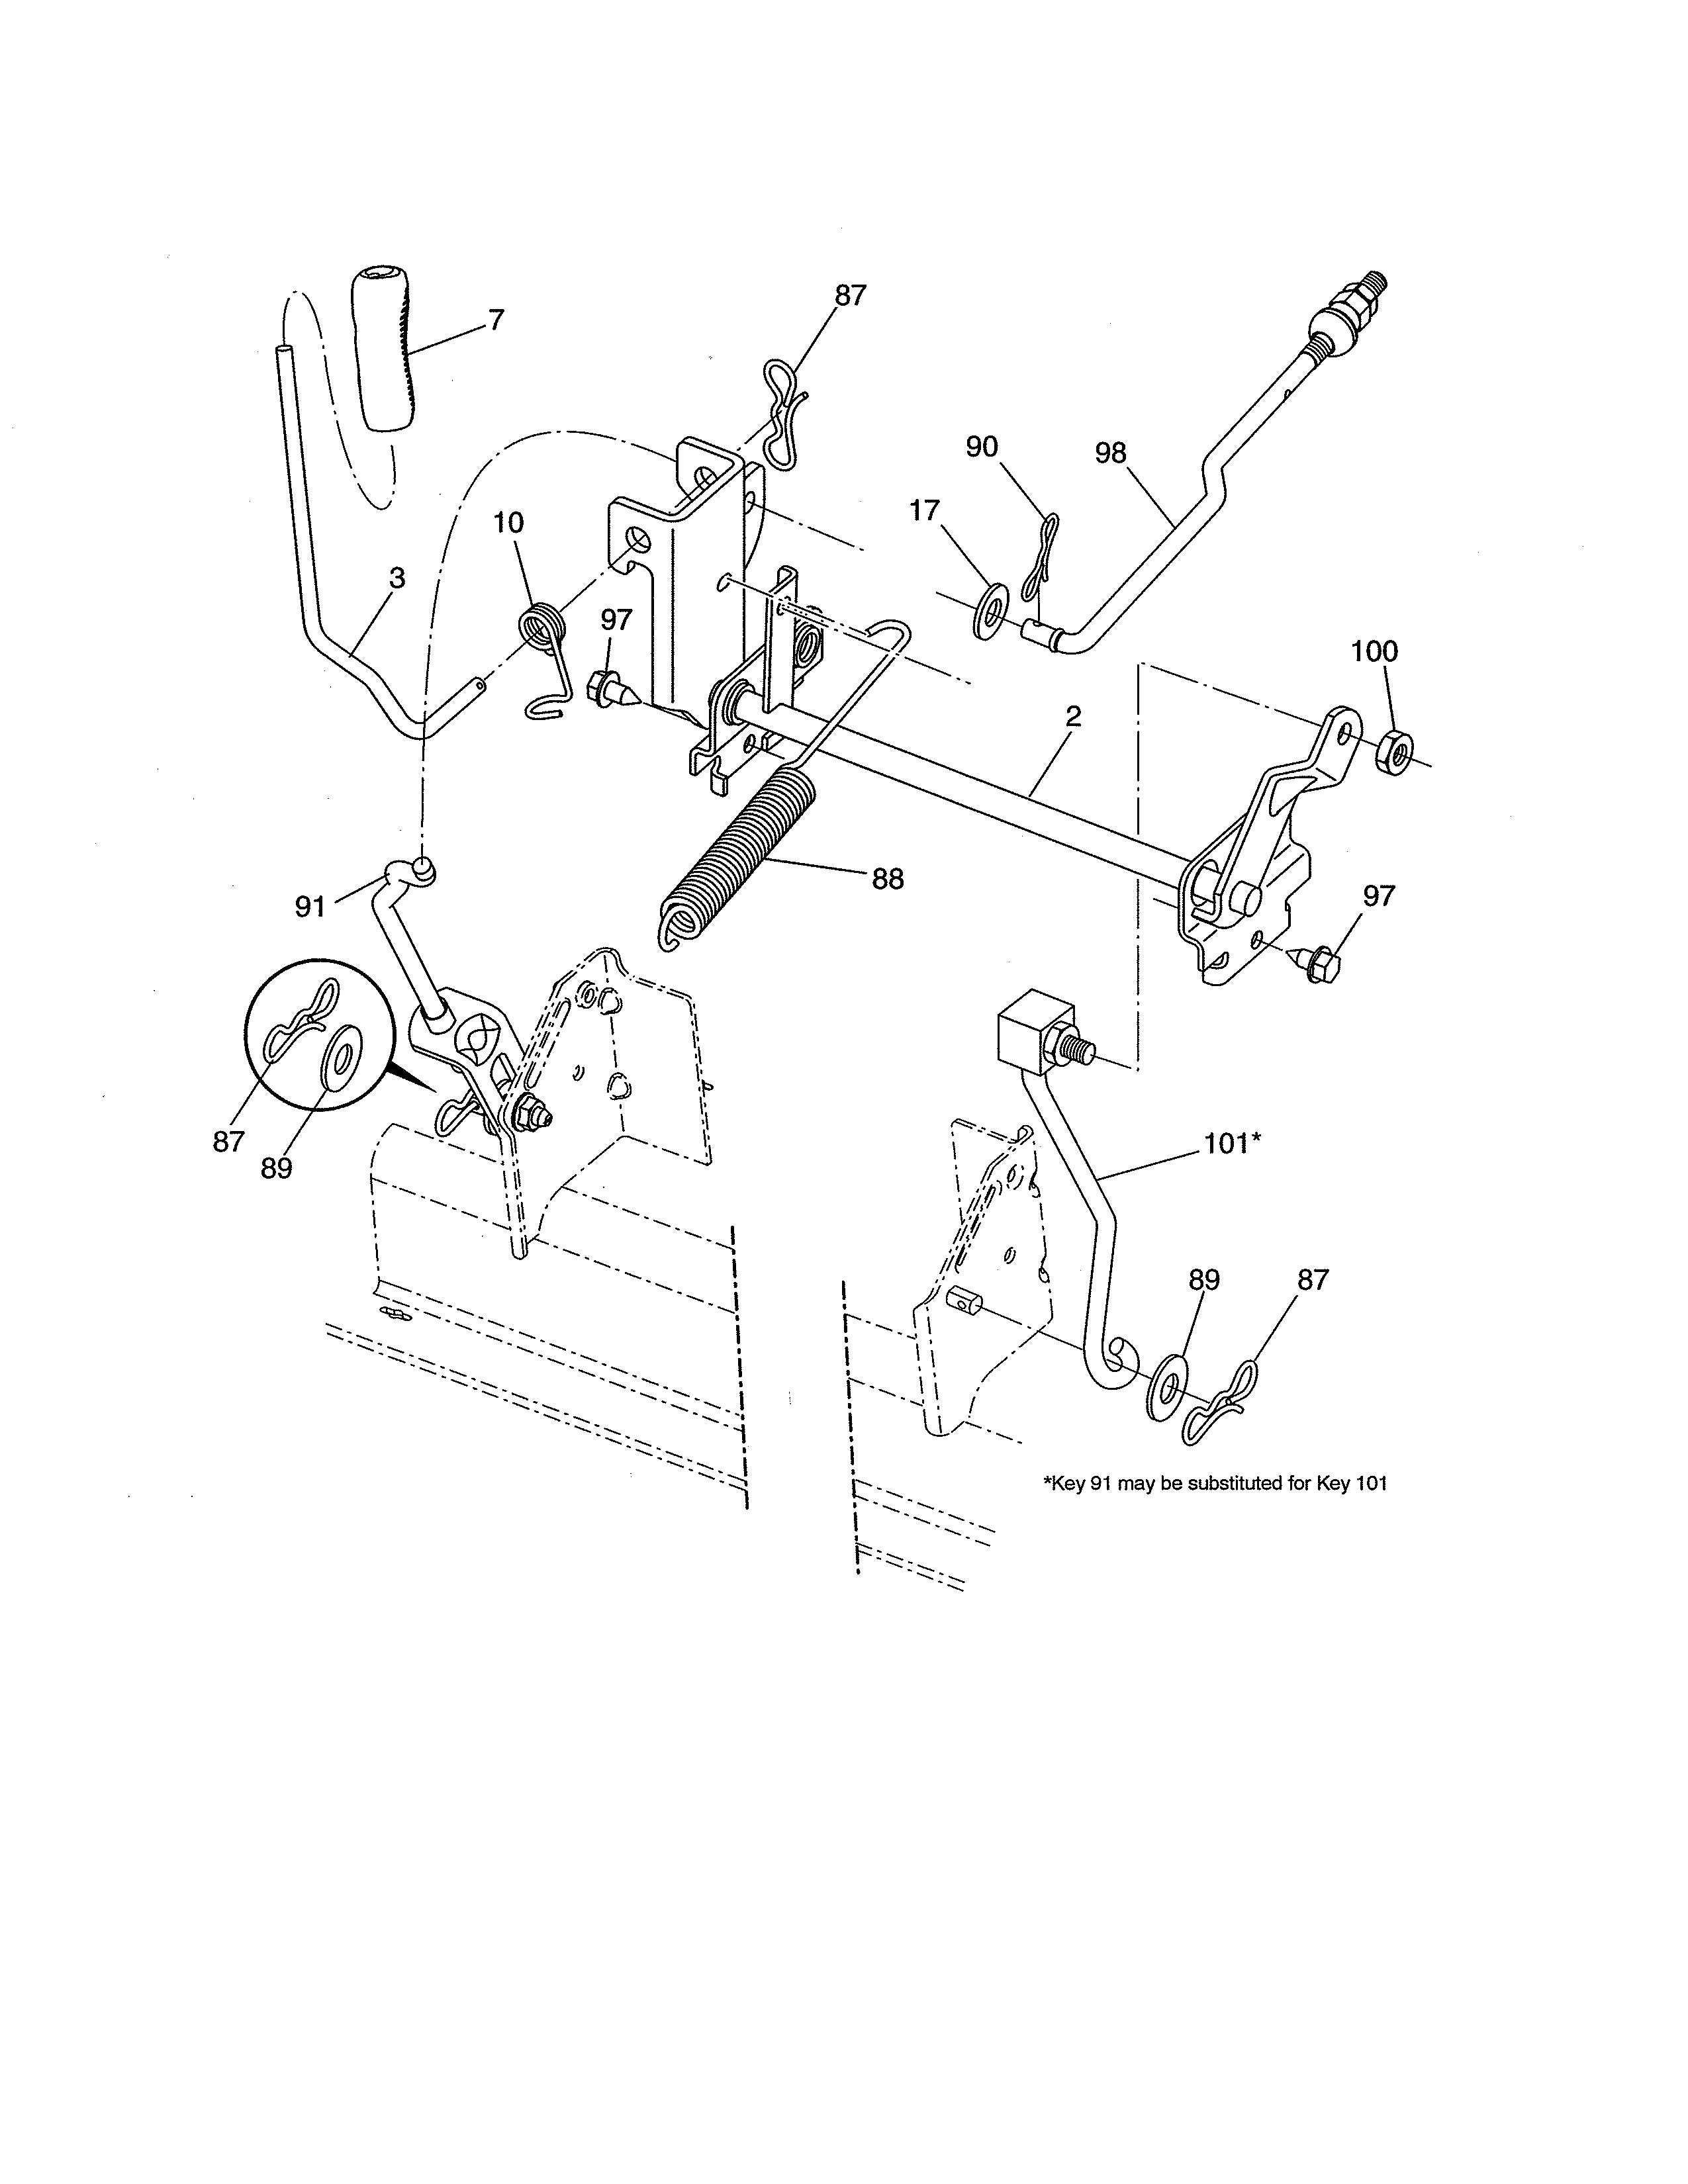 husqvarna model yta22v46 wiring diagram Model of Sarcomere